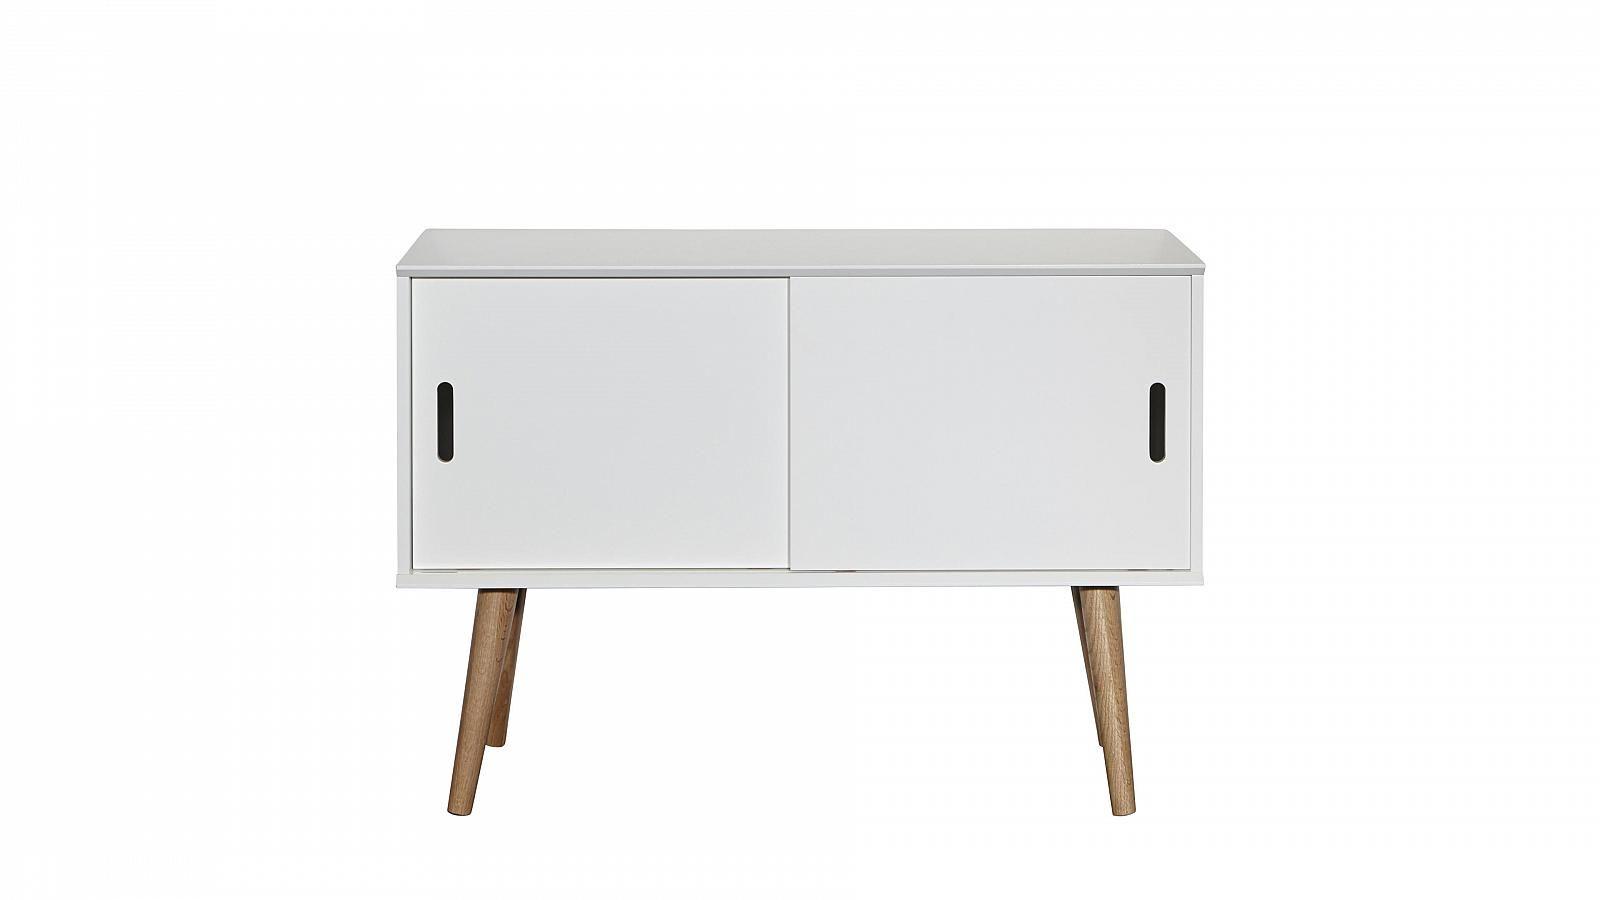 retro mbel gnstig a planen von retro mbel gnstig with retro mbel gnstig top vintage mobel. Black Bedroom Furniture Sets. Home Design Ideas